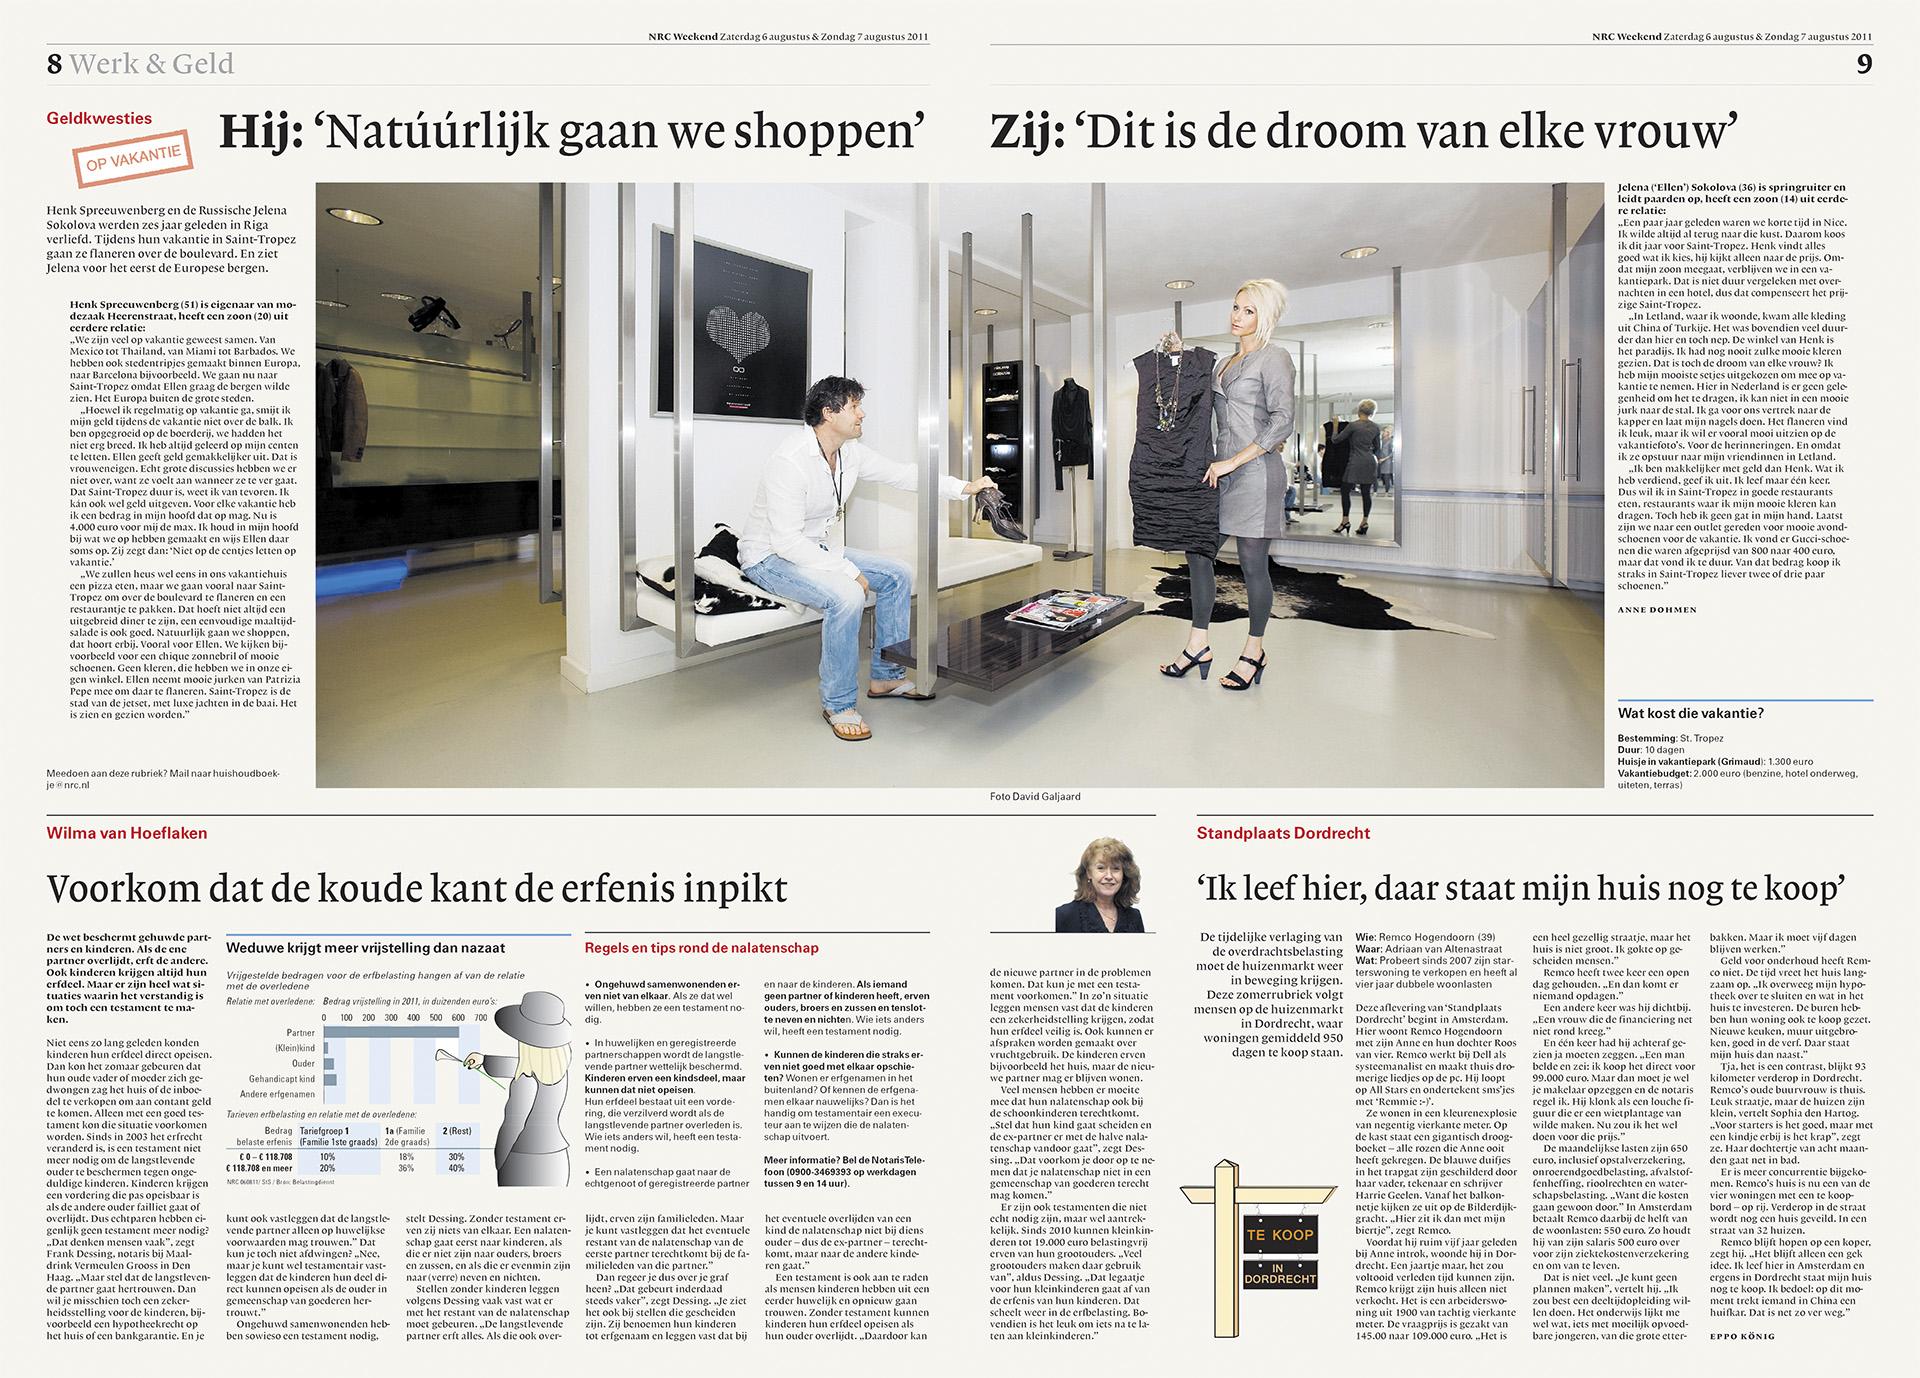 NRC Handelsblad - Huishoudboekje - David Galjaard